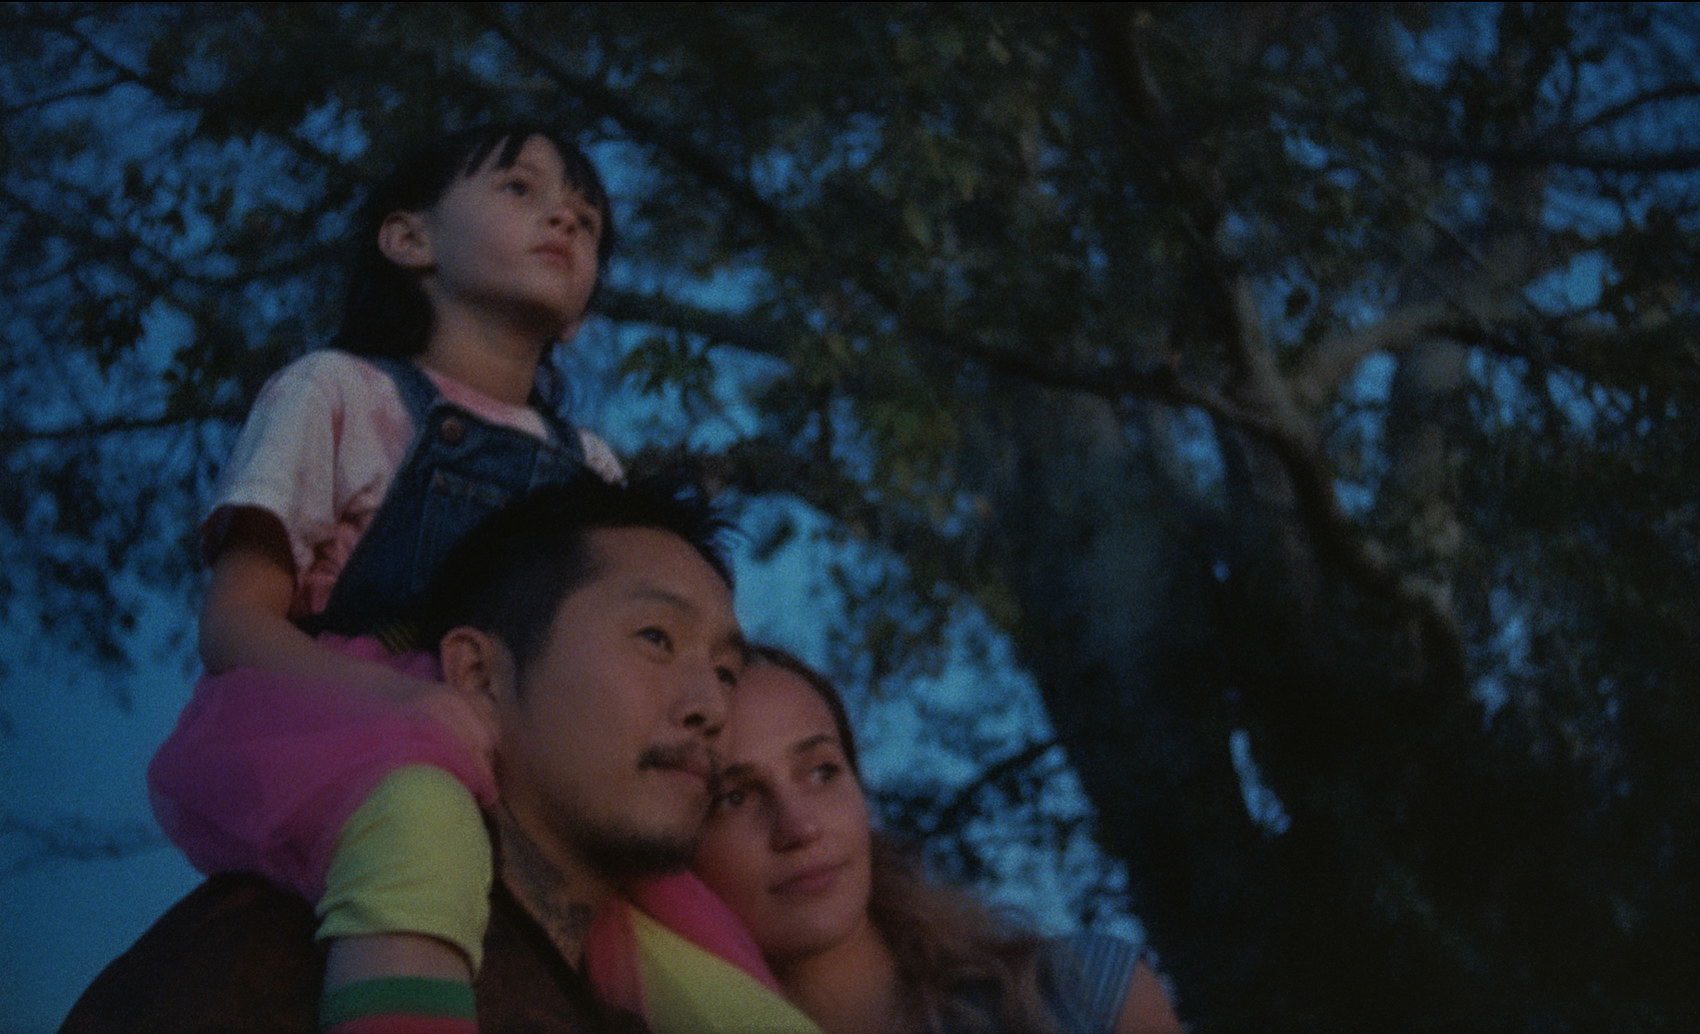 Antonio, Kathy, and Jessie watching the sunset